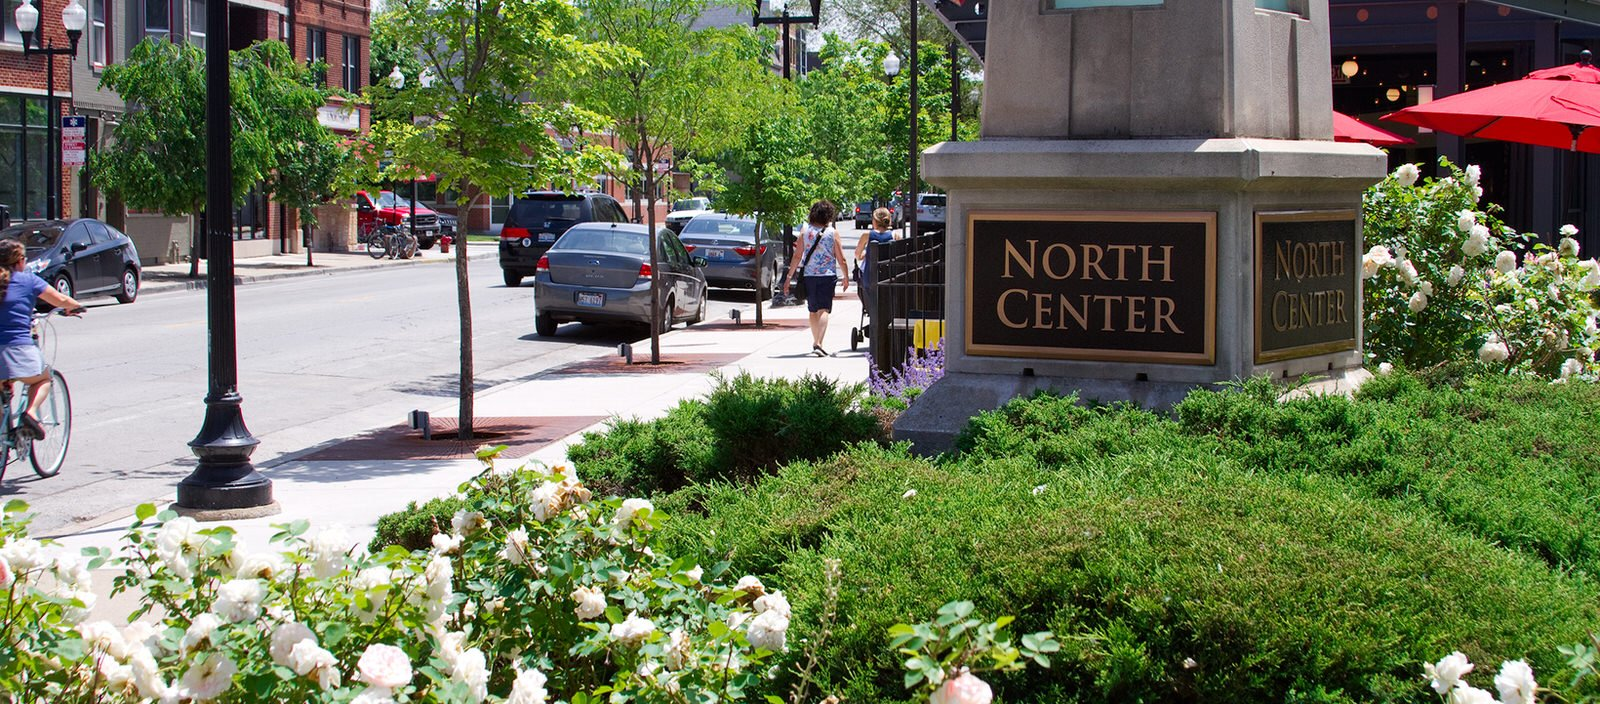 North Center Chicago Limousine Service